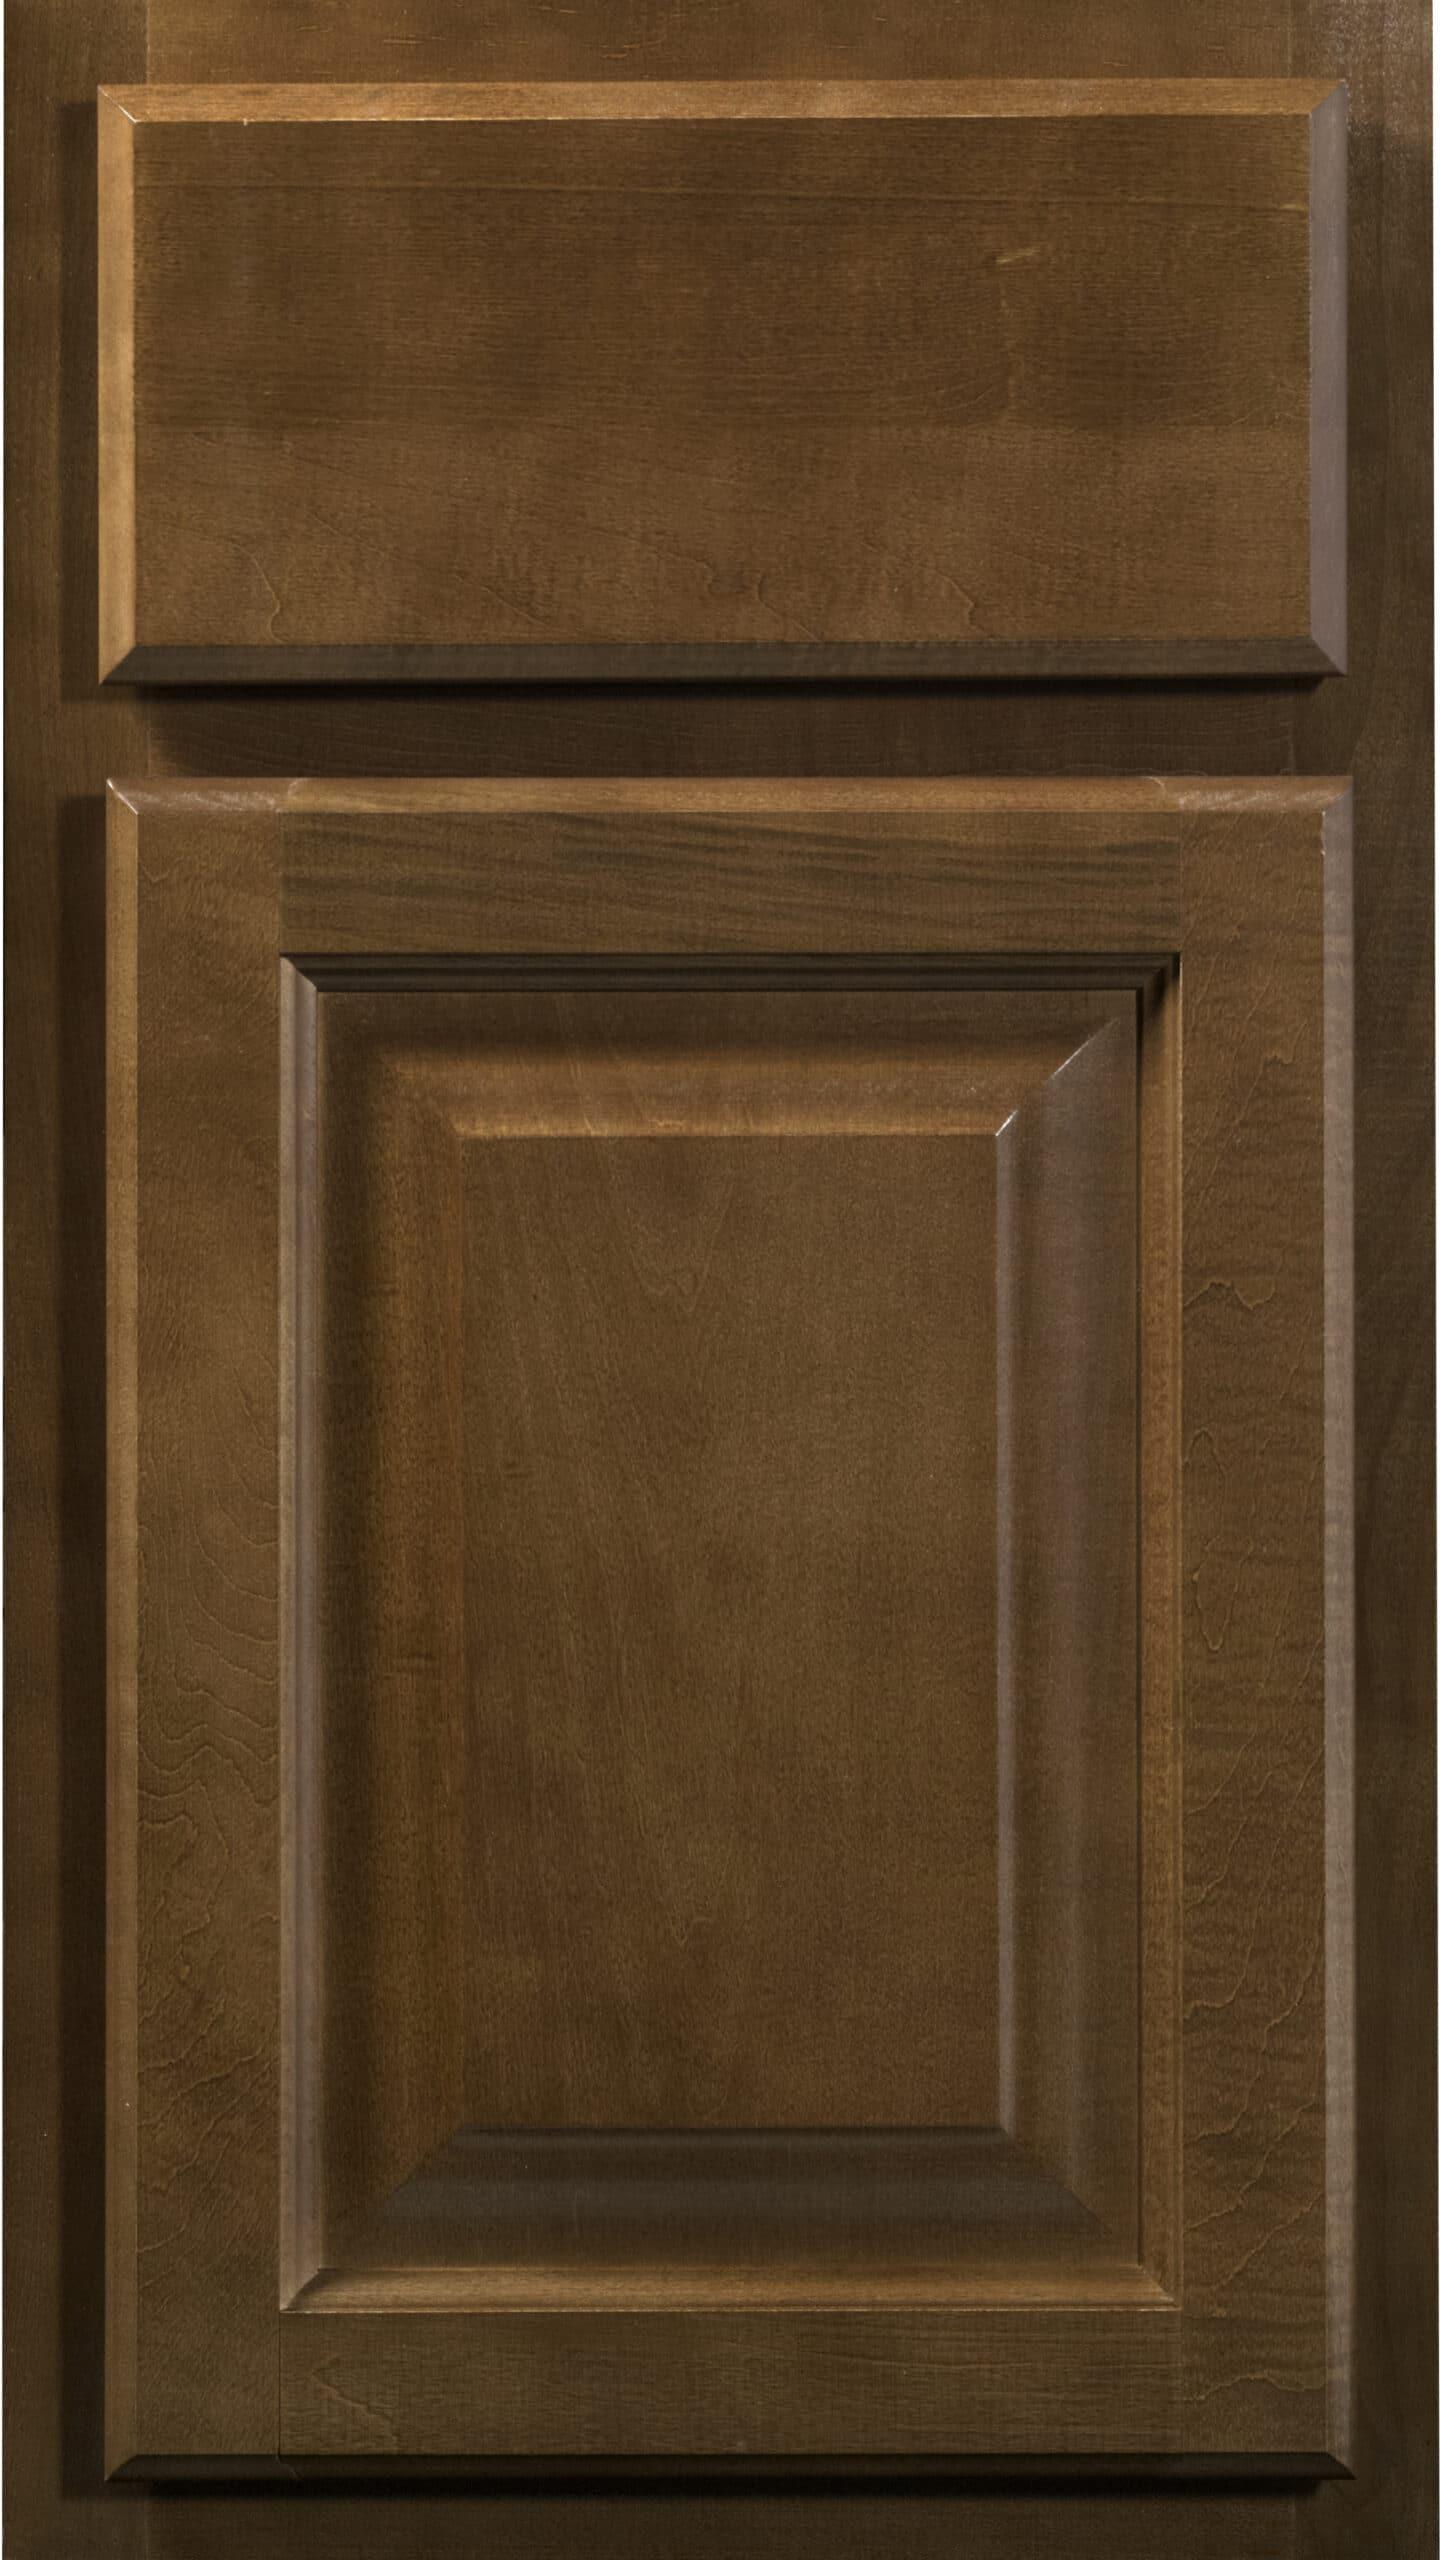 Saginaw Chestnut Cabinets